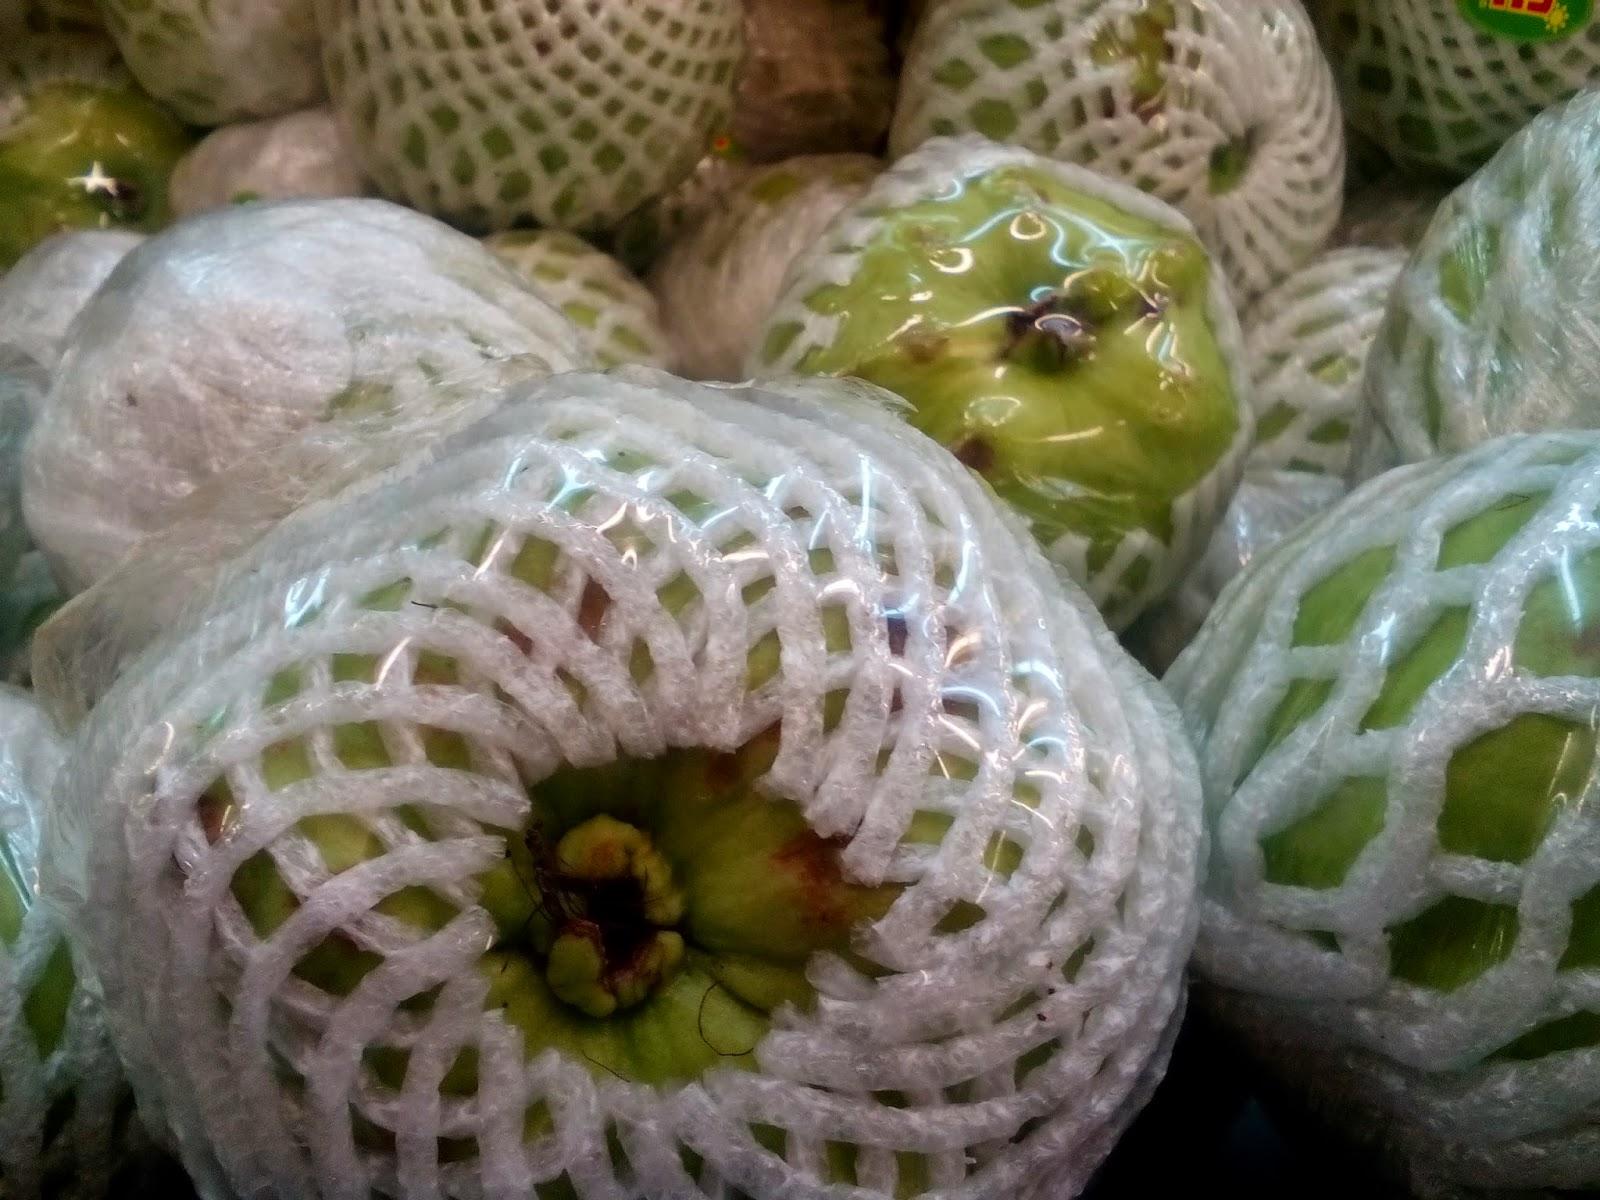 Guava crystal (dokpri)